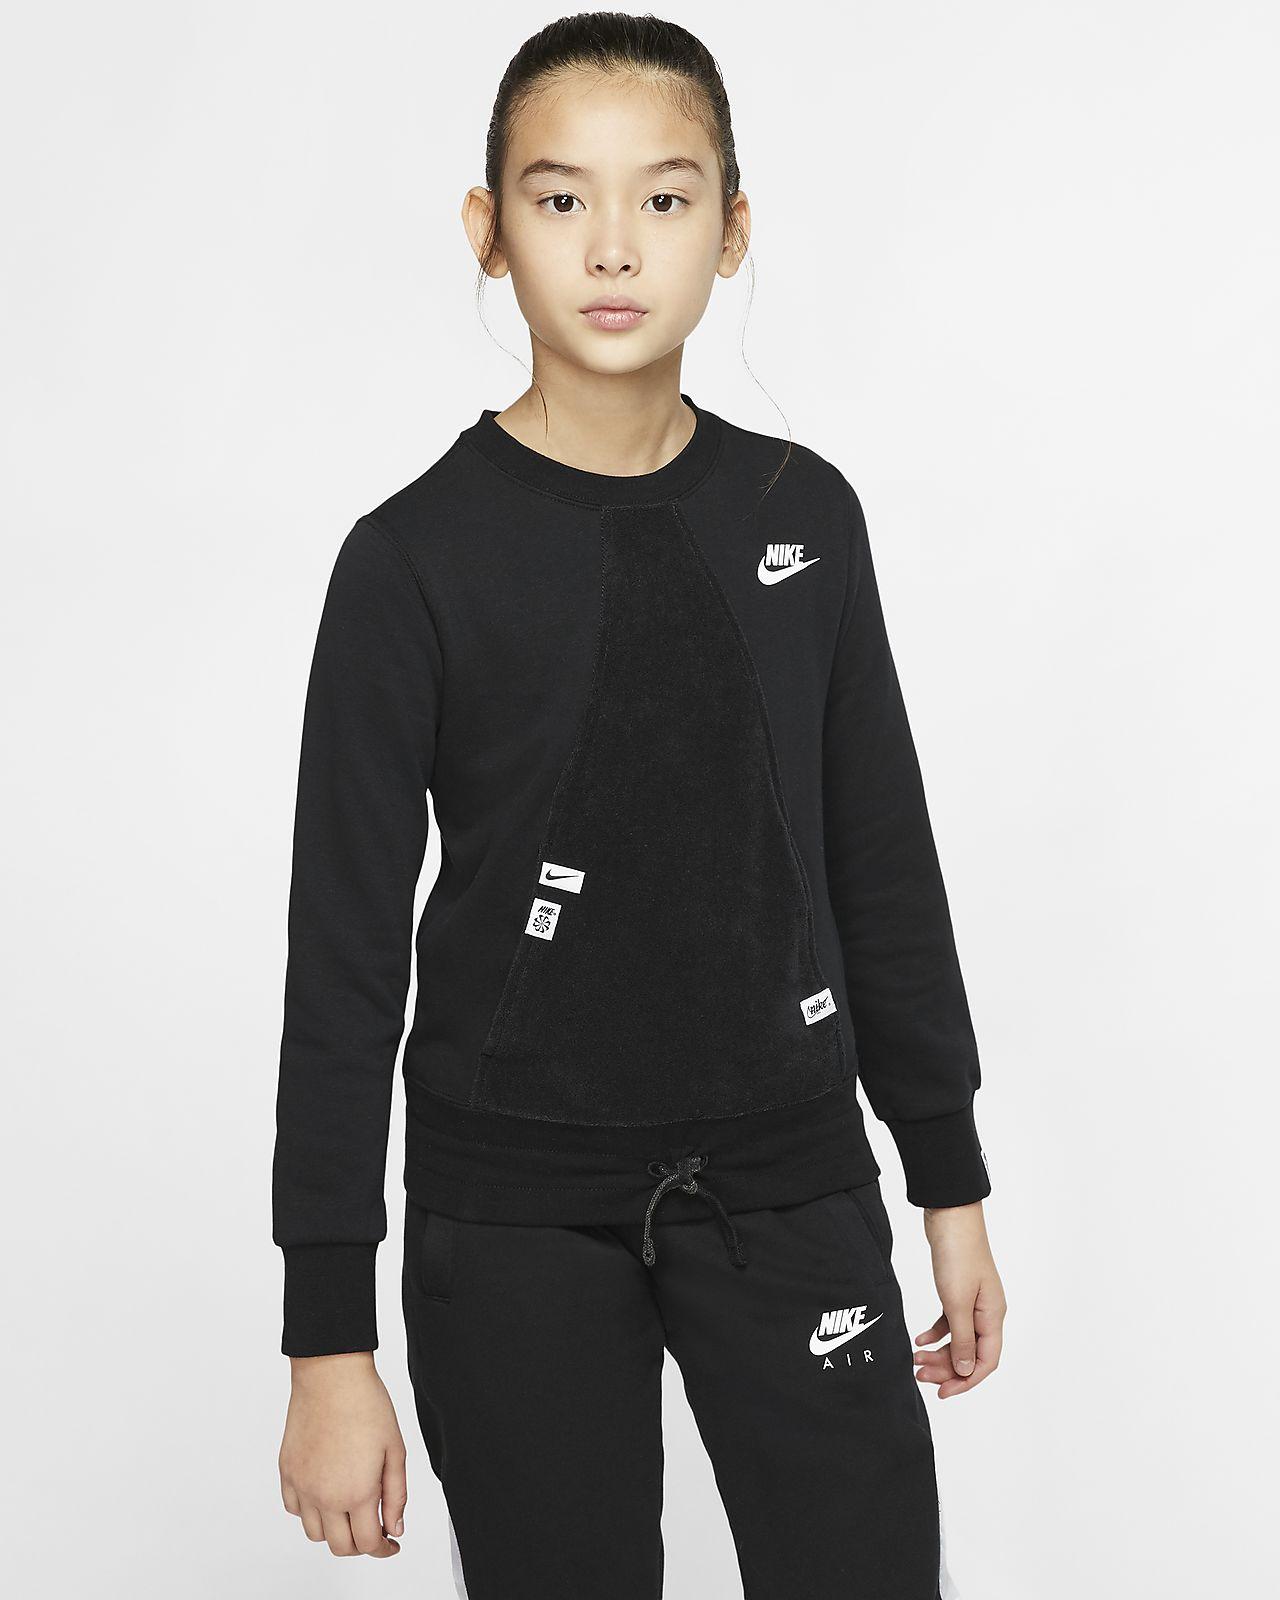 Camisola de manga comprida Nike Sportswear Heritage Júnior (Rapariga)